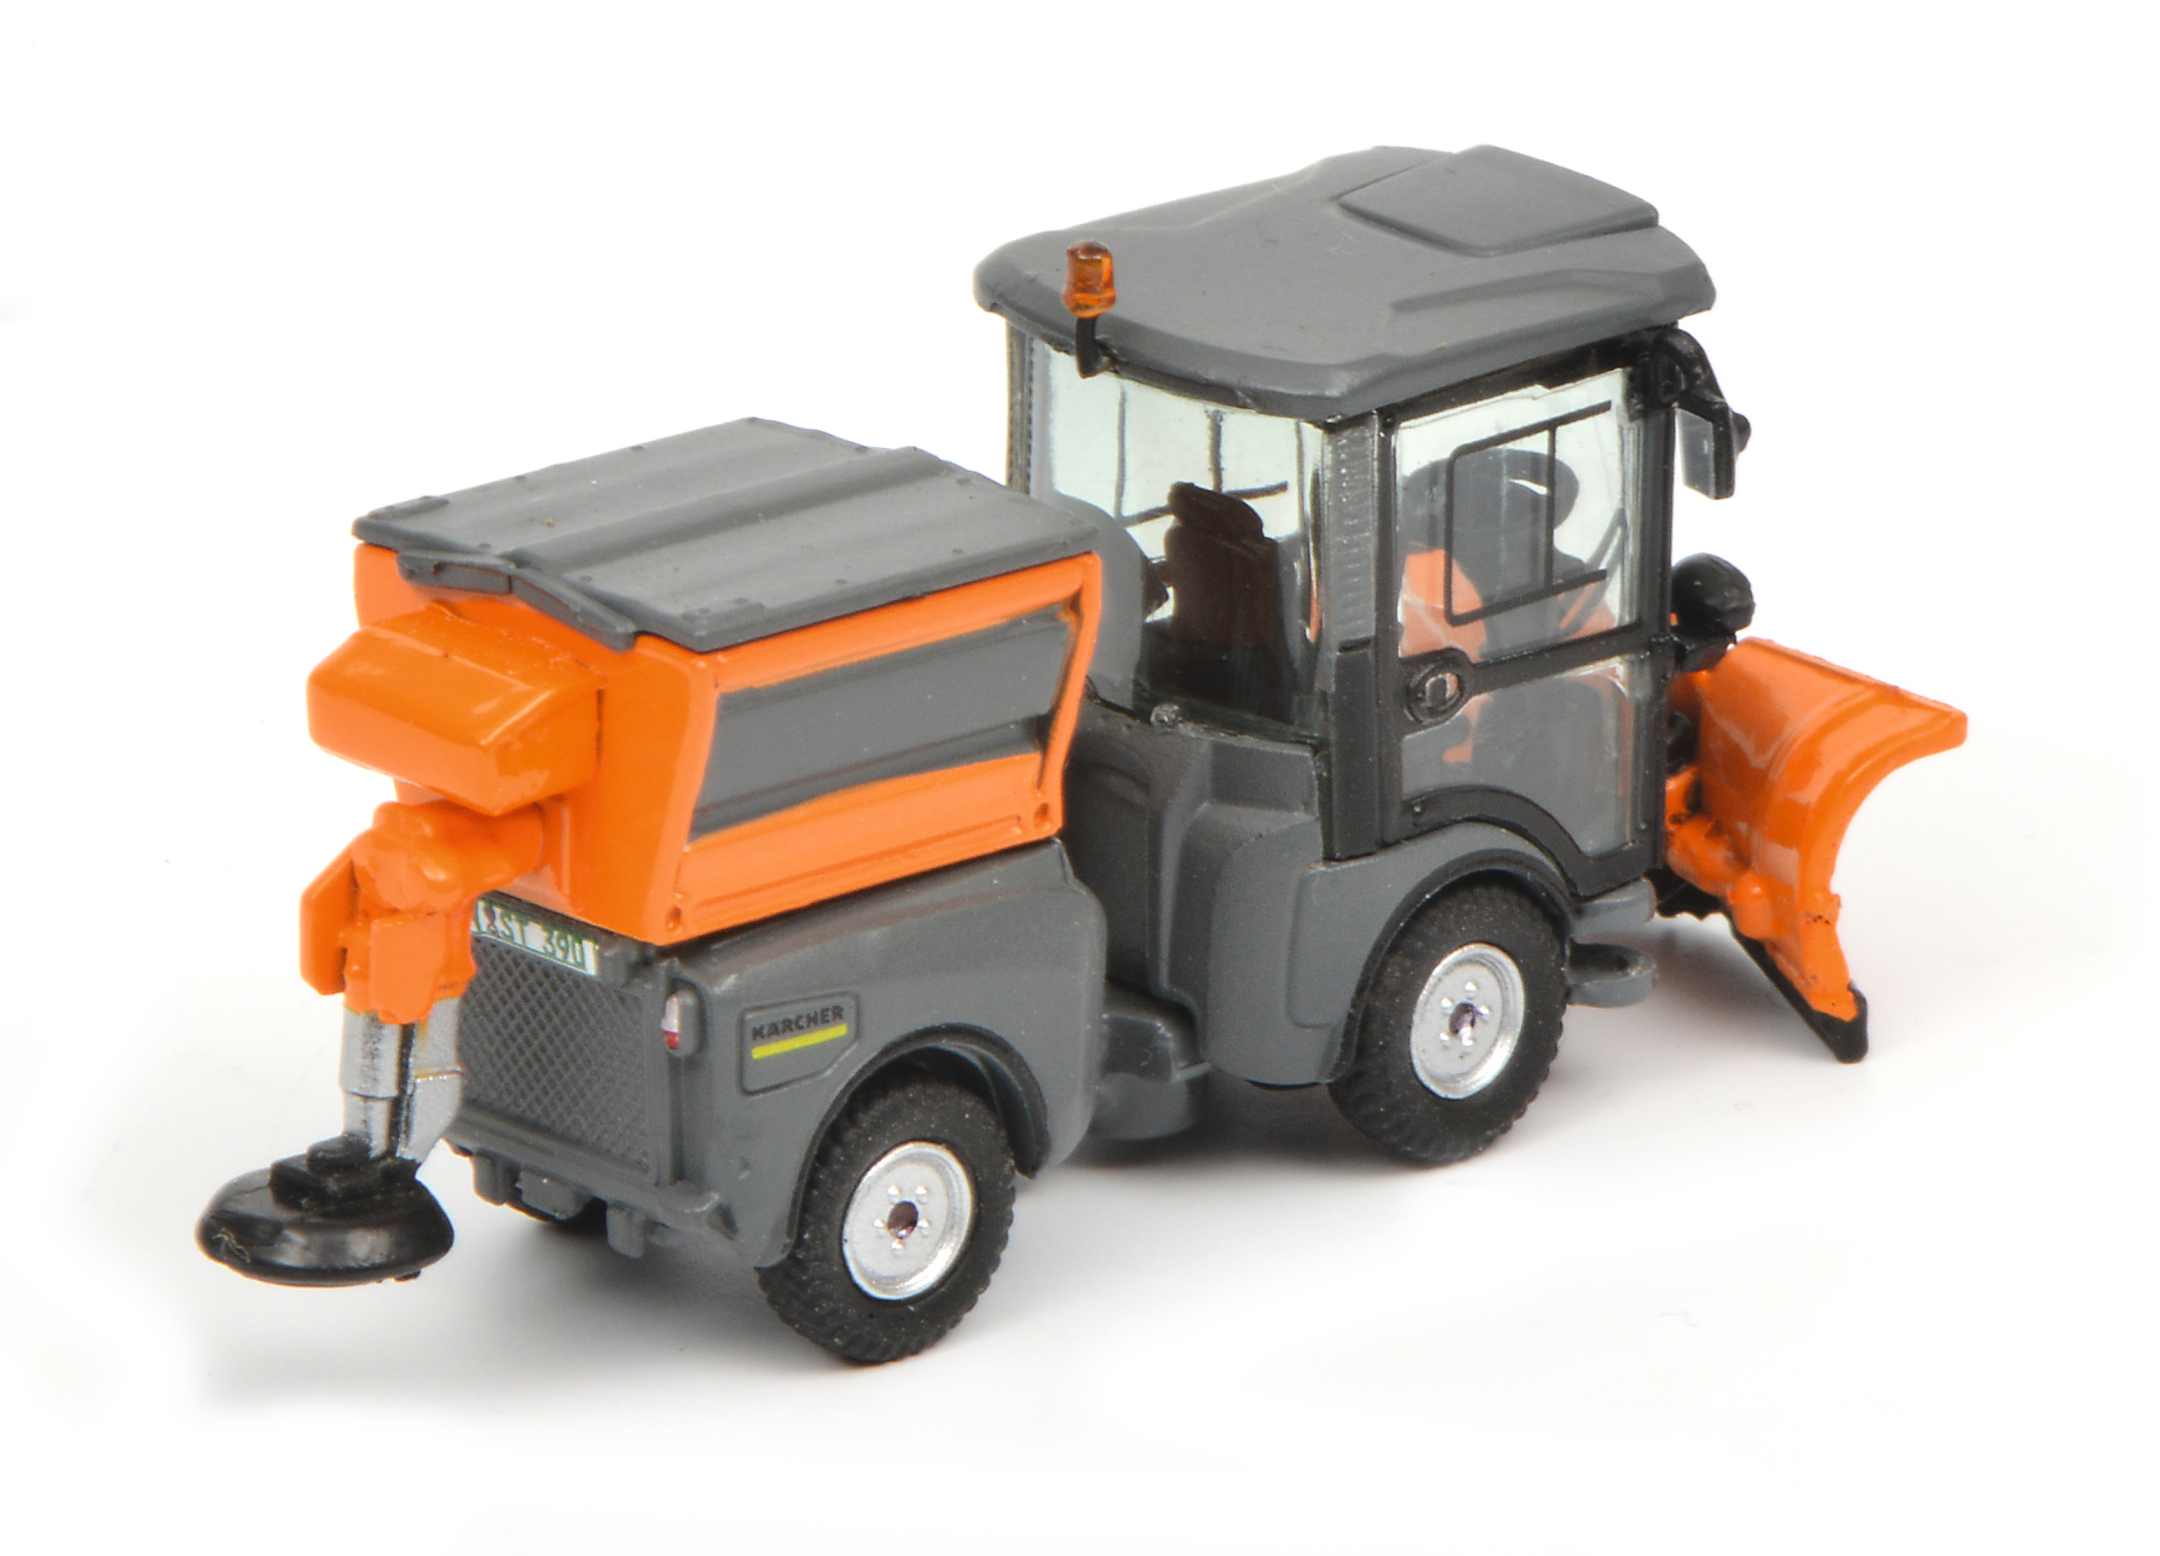 Kärcher MC 130 Winterdienst 452628900 Art.-Nr Schuco Modell H0 1:87